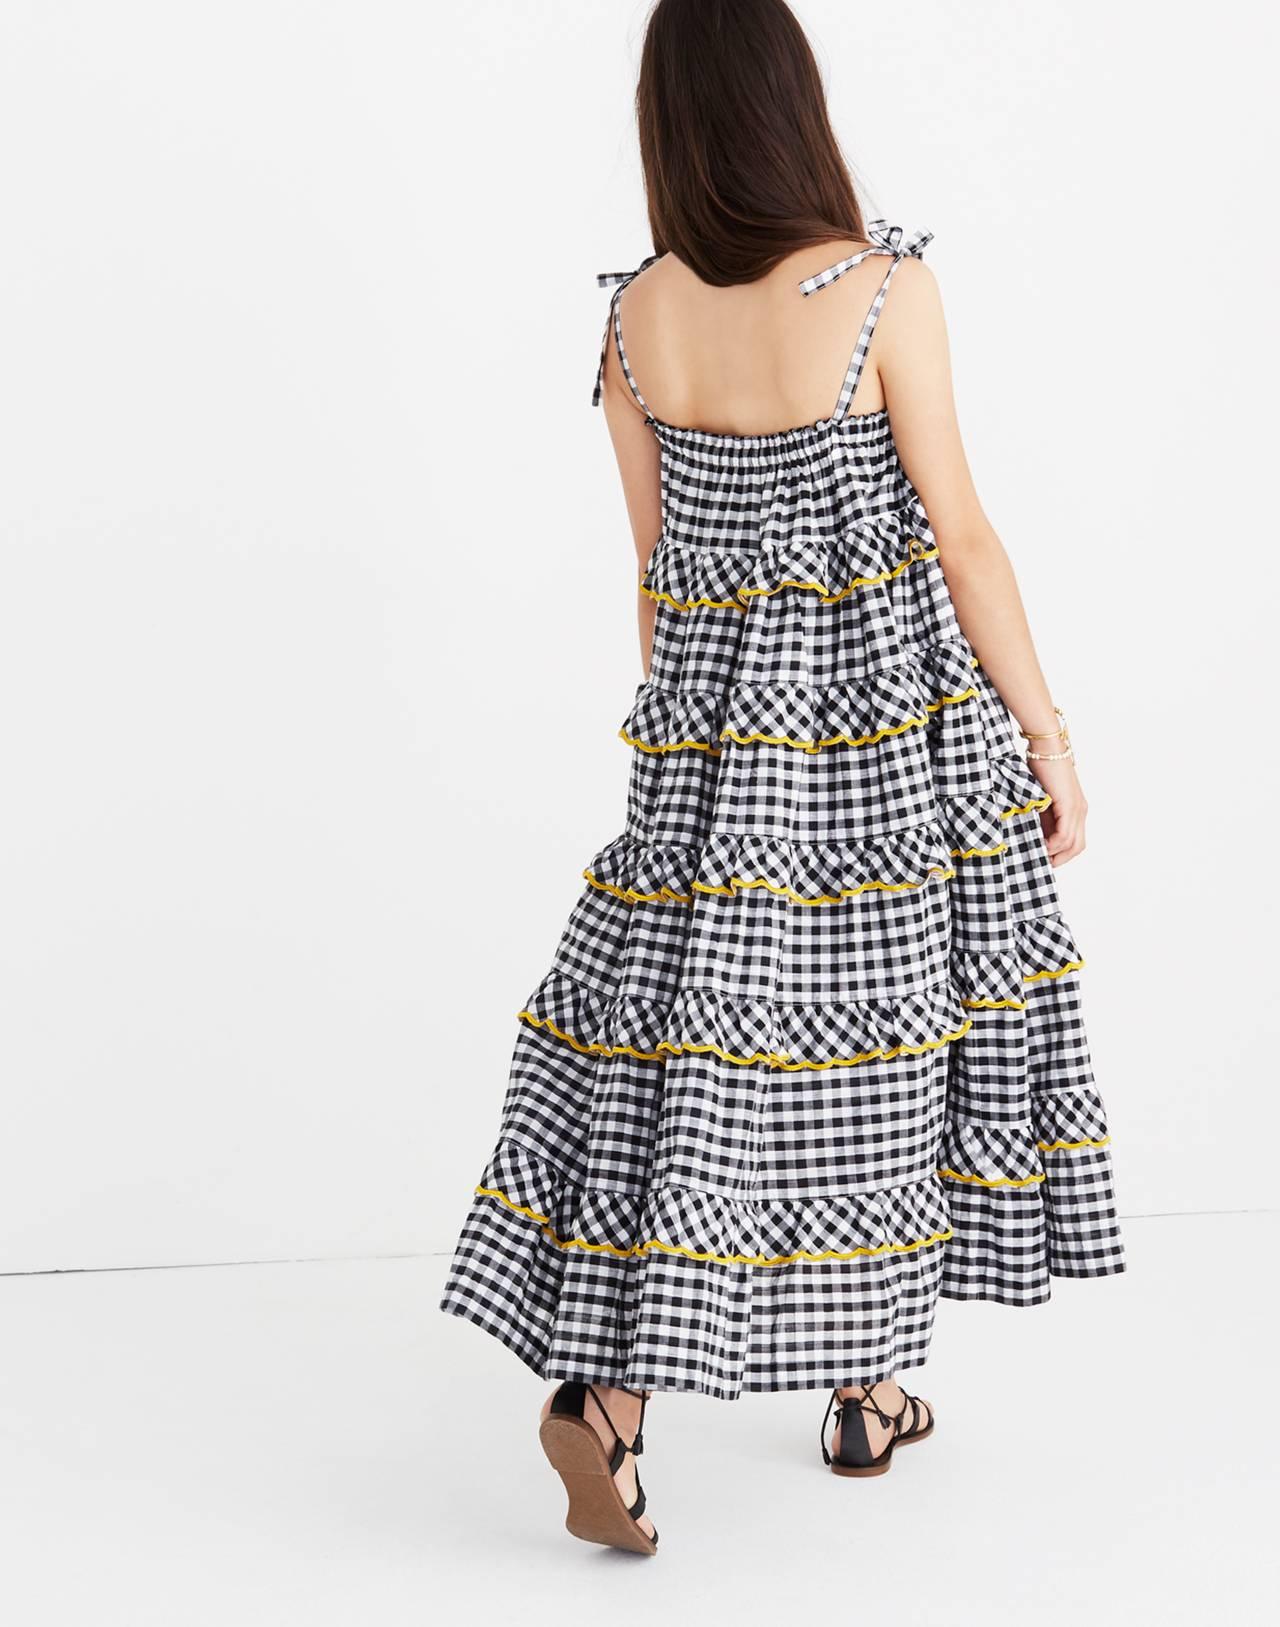 Innika Choo Tiered Gingham Avens Dress in black check image 3